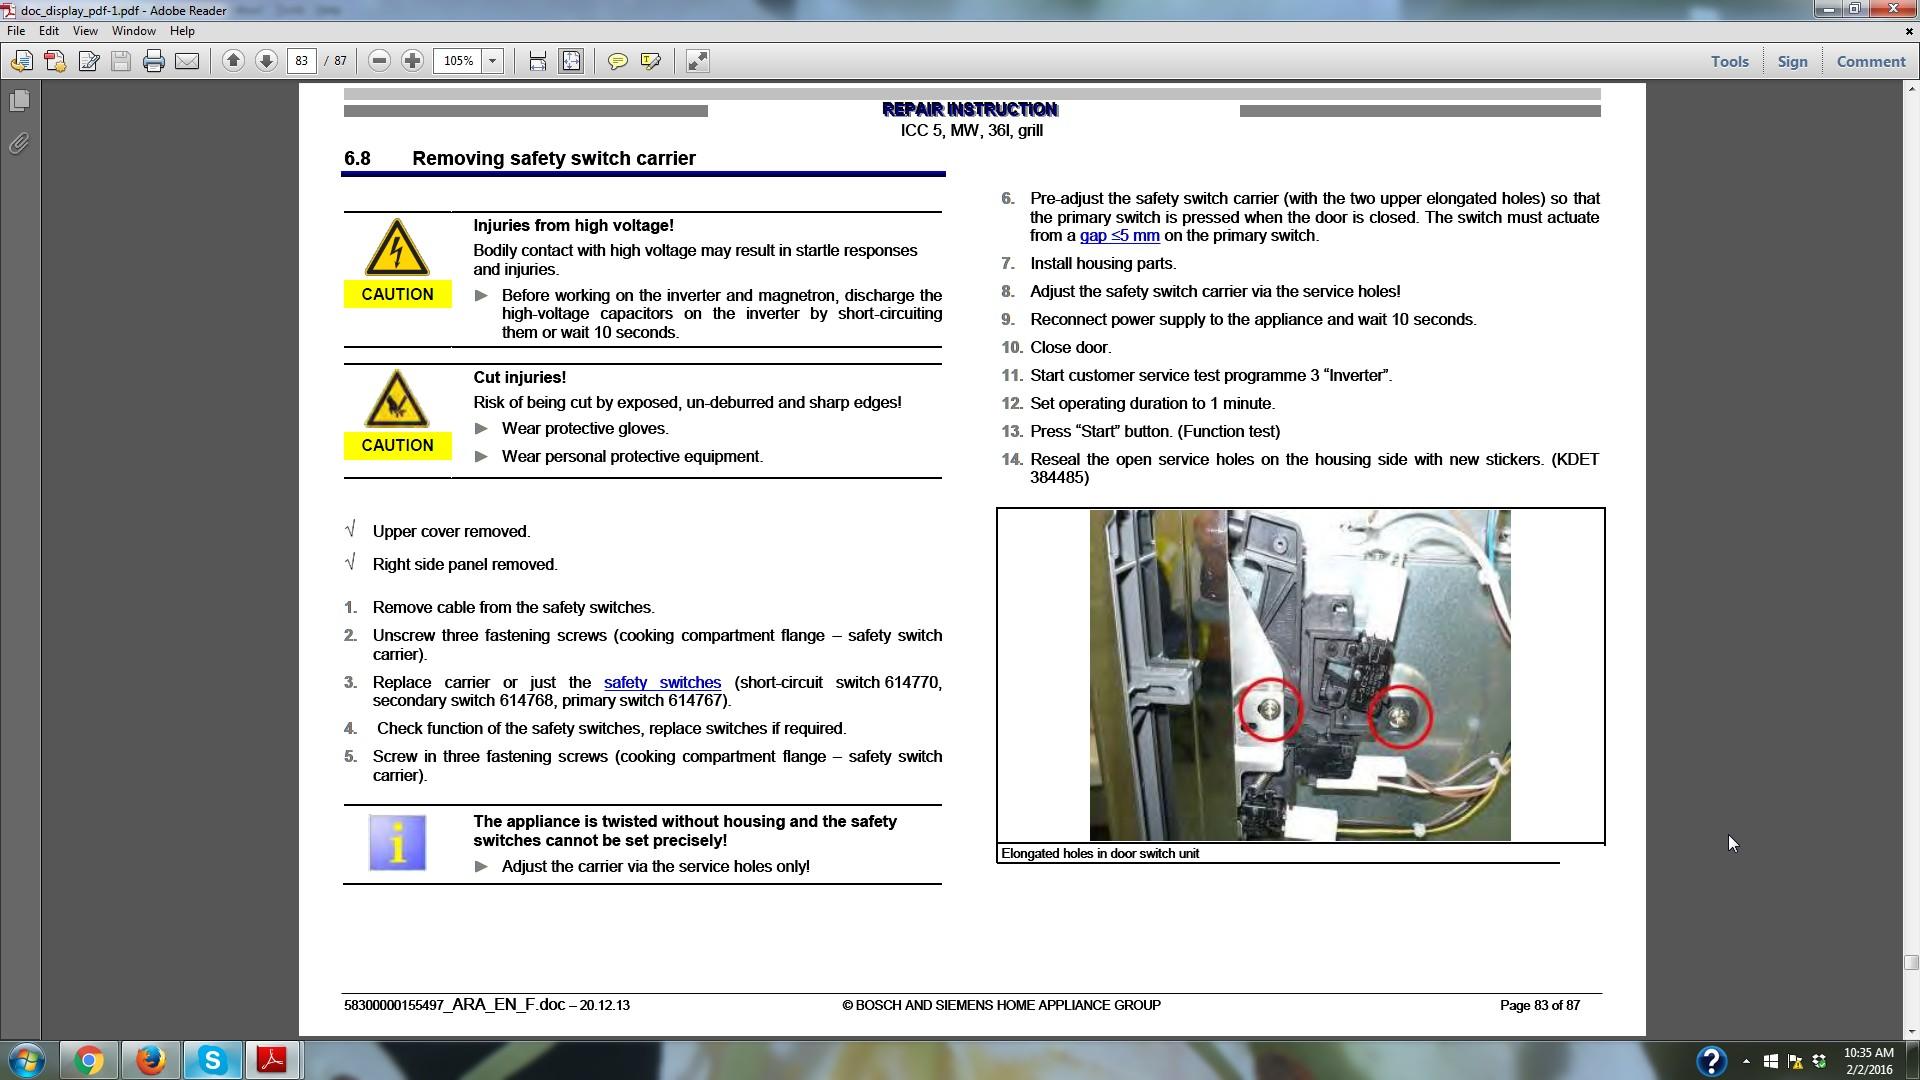 558145a7-e93a-4721-8bda-9bc55b1bfd36_ScreenHunter_1809 Feb. 02 10.36.jpg